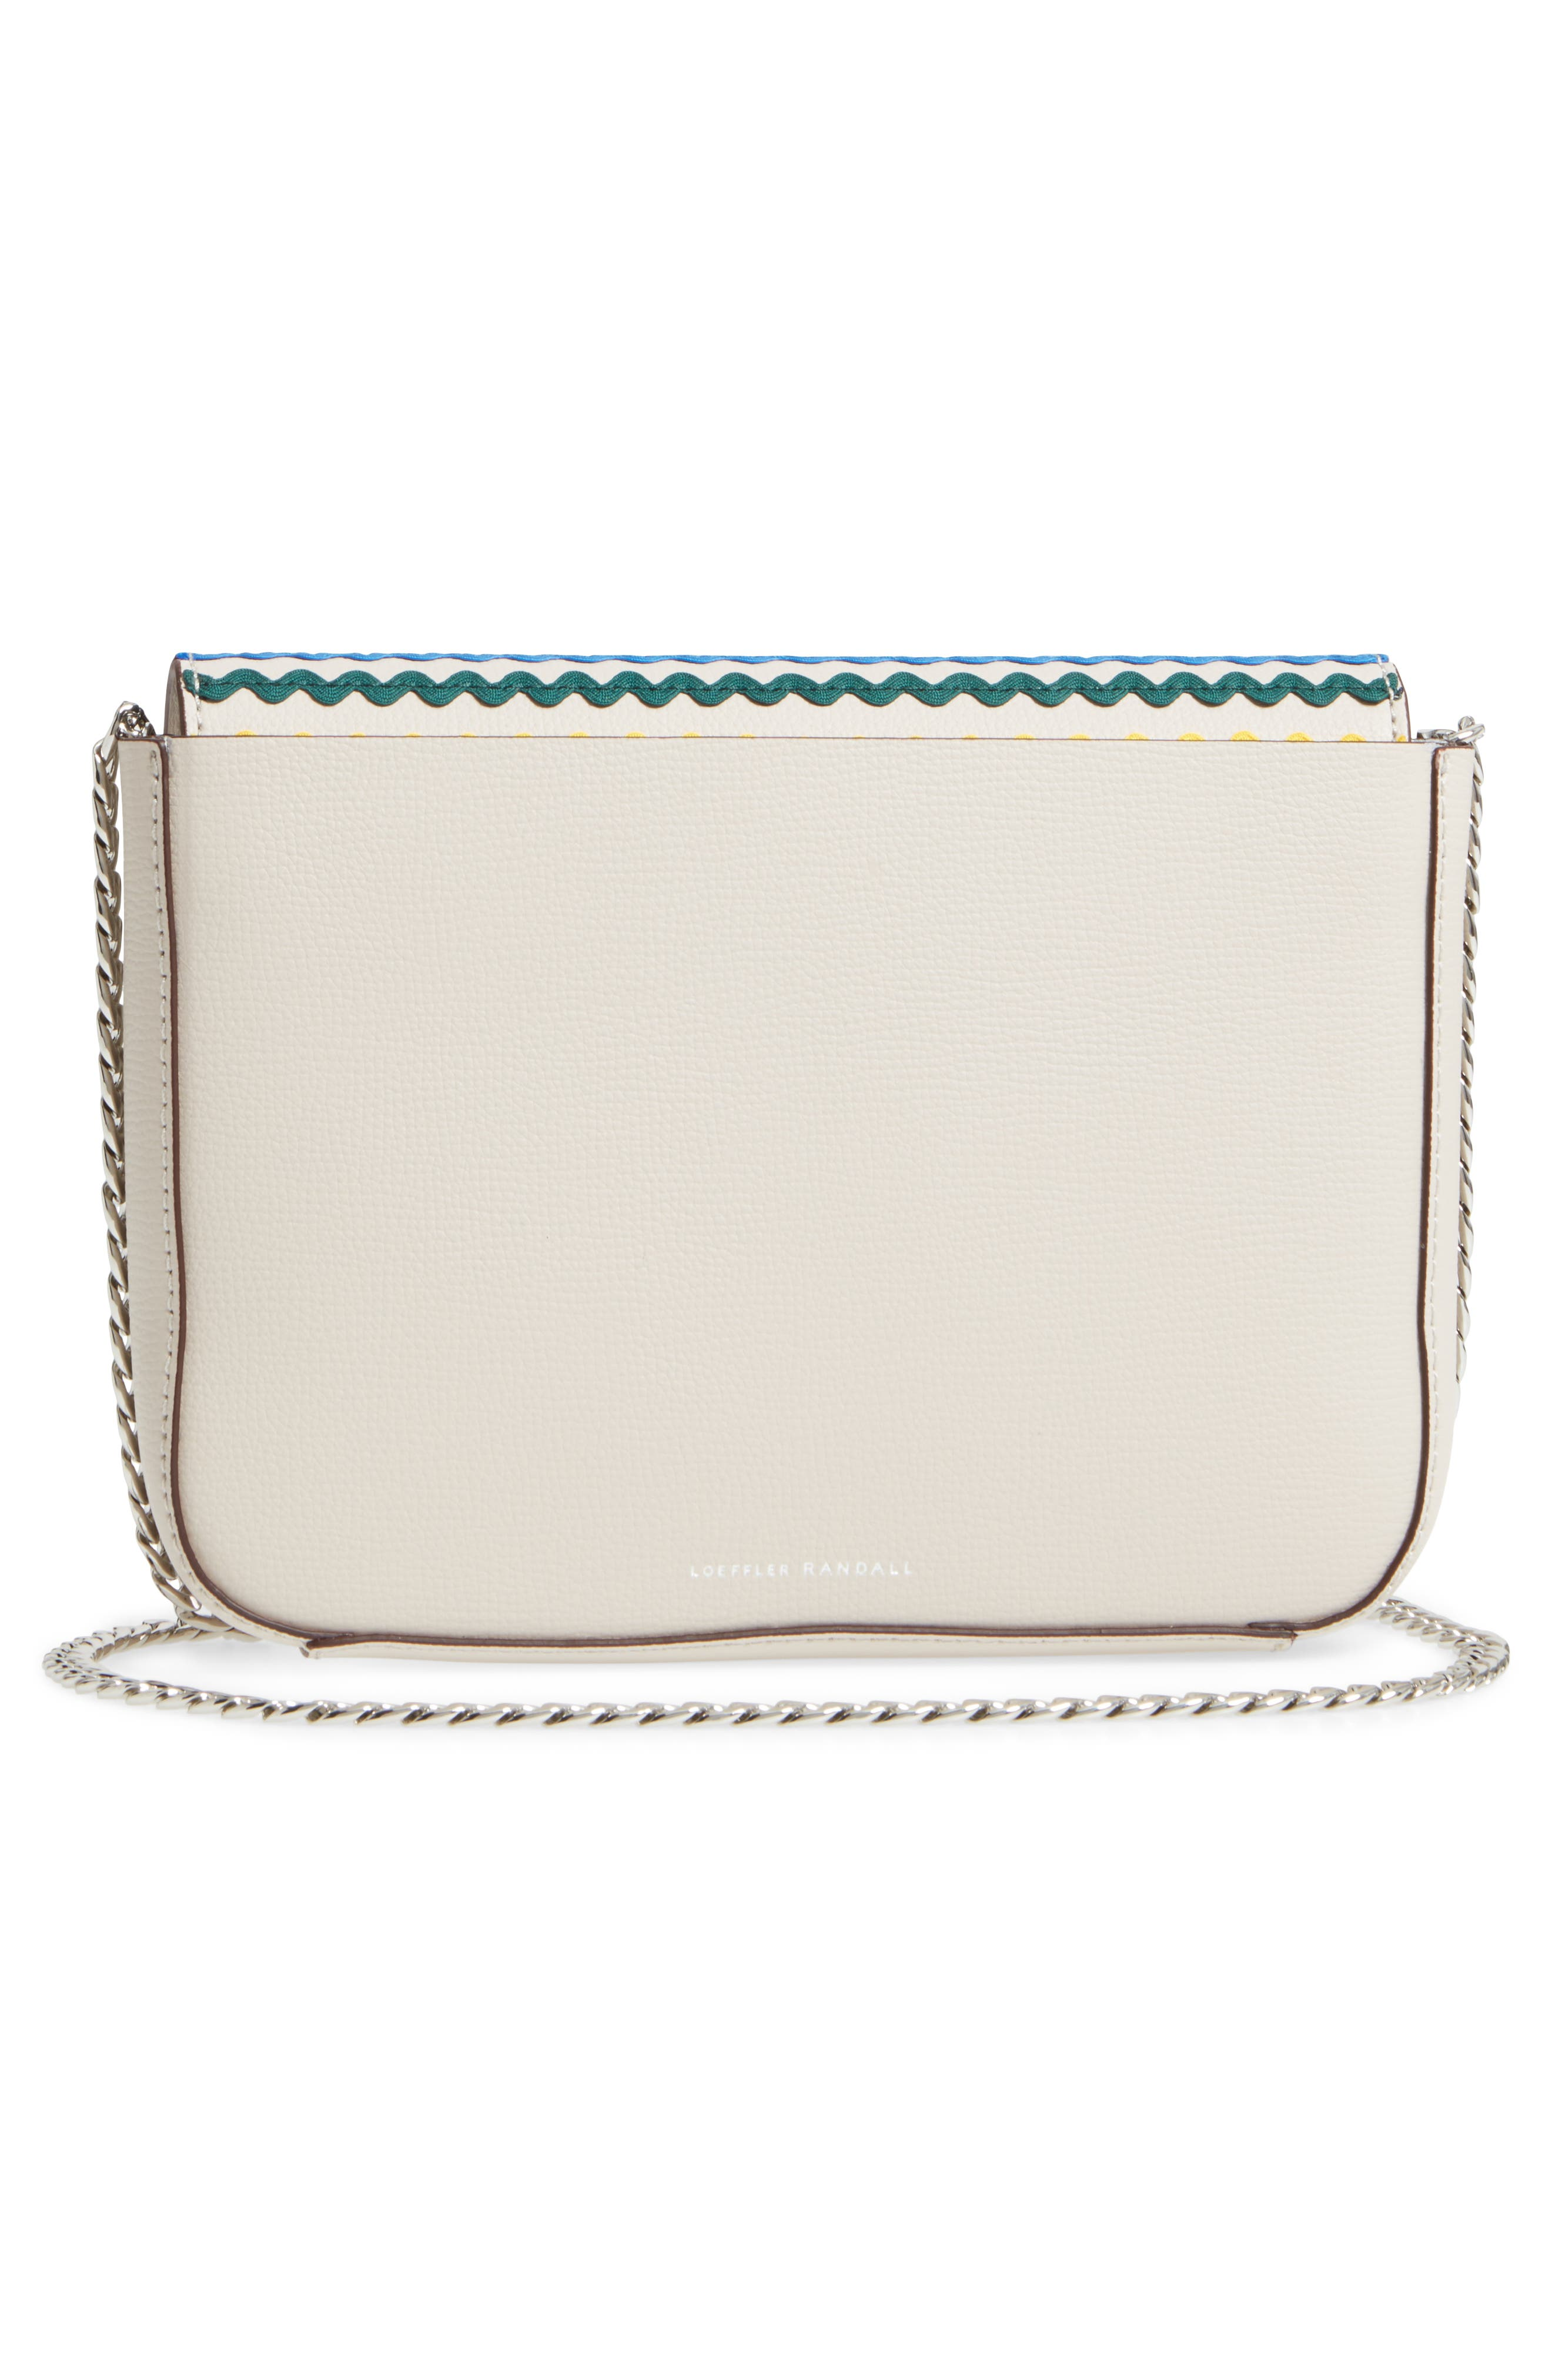 Lock Leather Flap Clutch/Shoulder Bag,                             Alternate thumbnail 3, color,                             Stone/ Rainbow